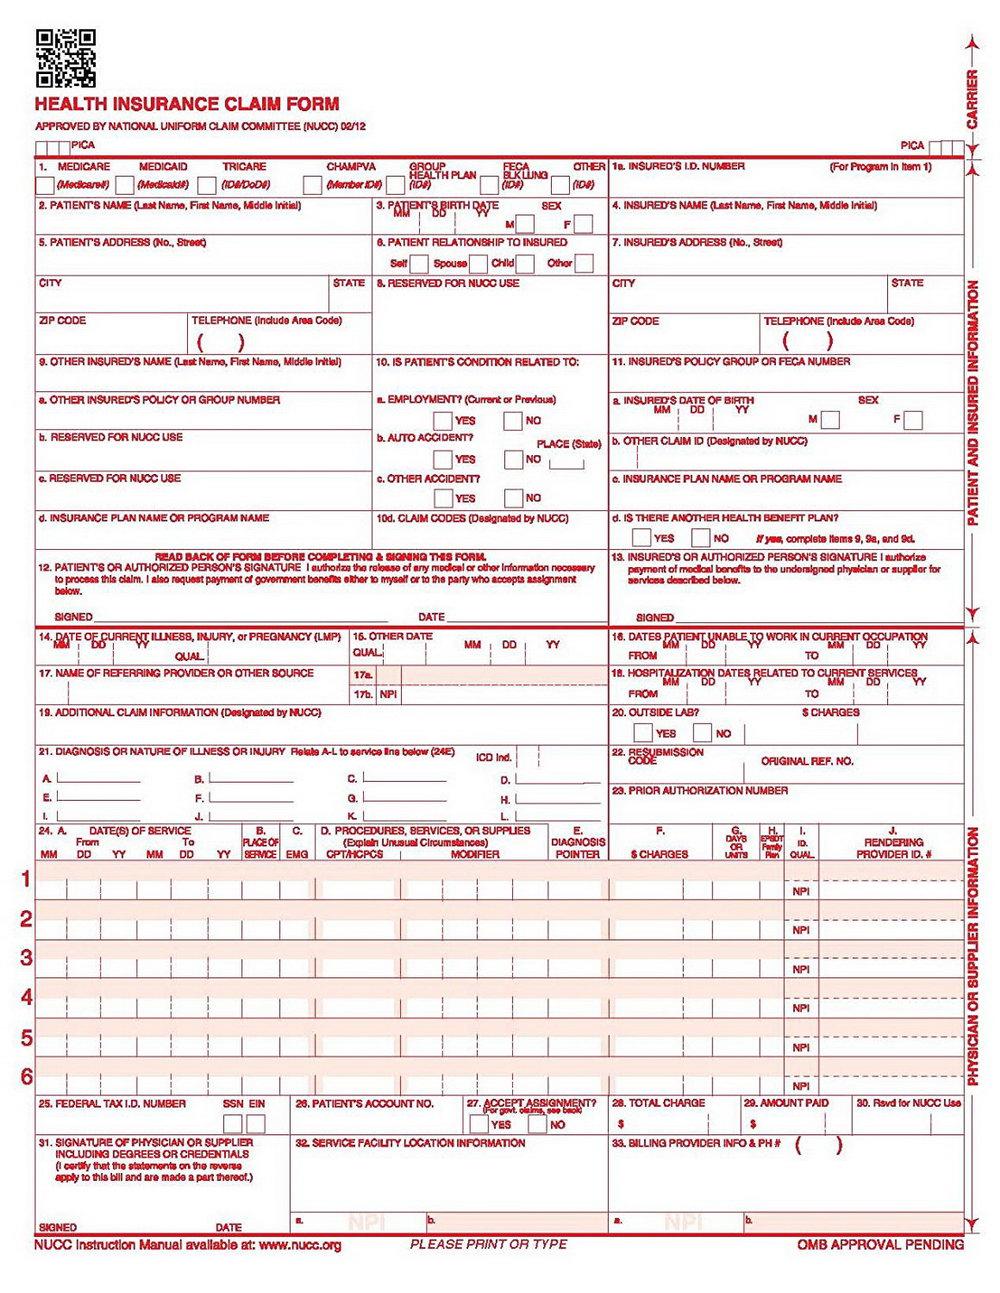 Cms 1500 Claim Form